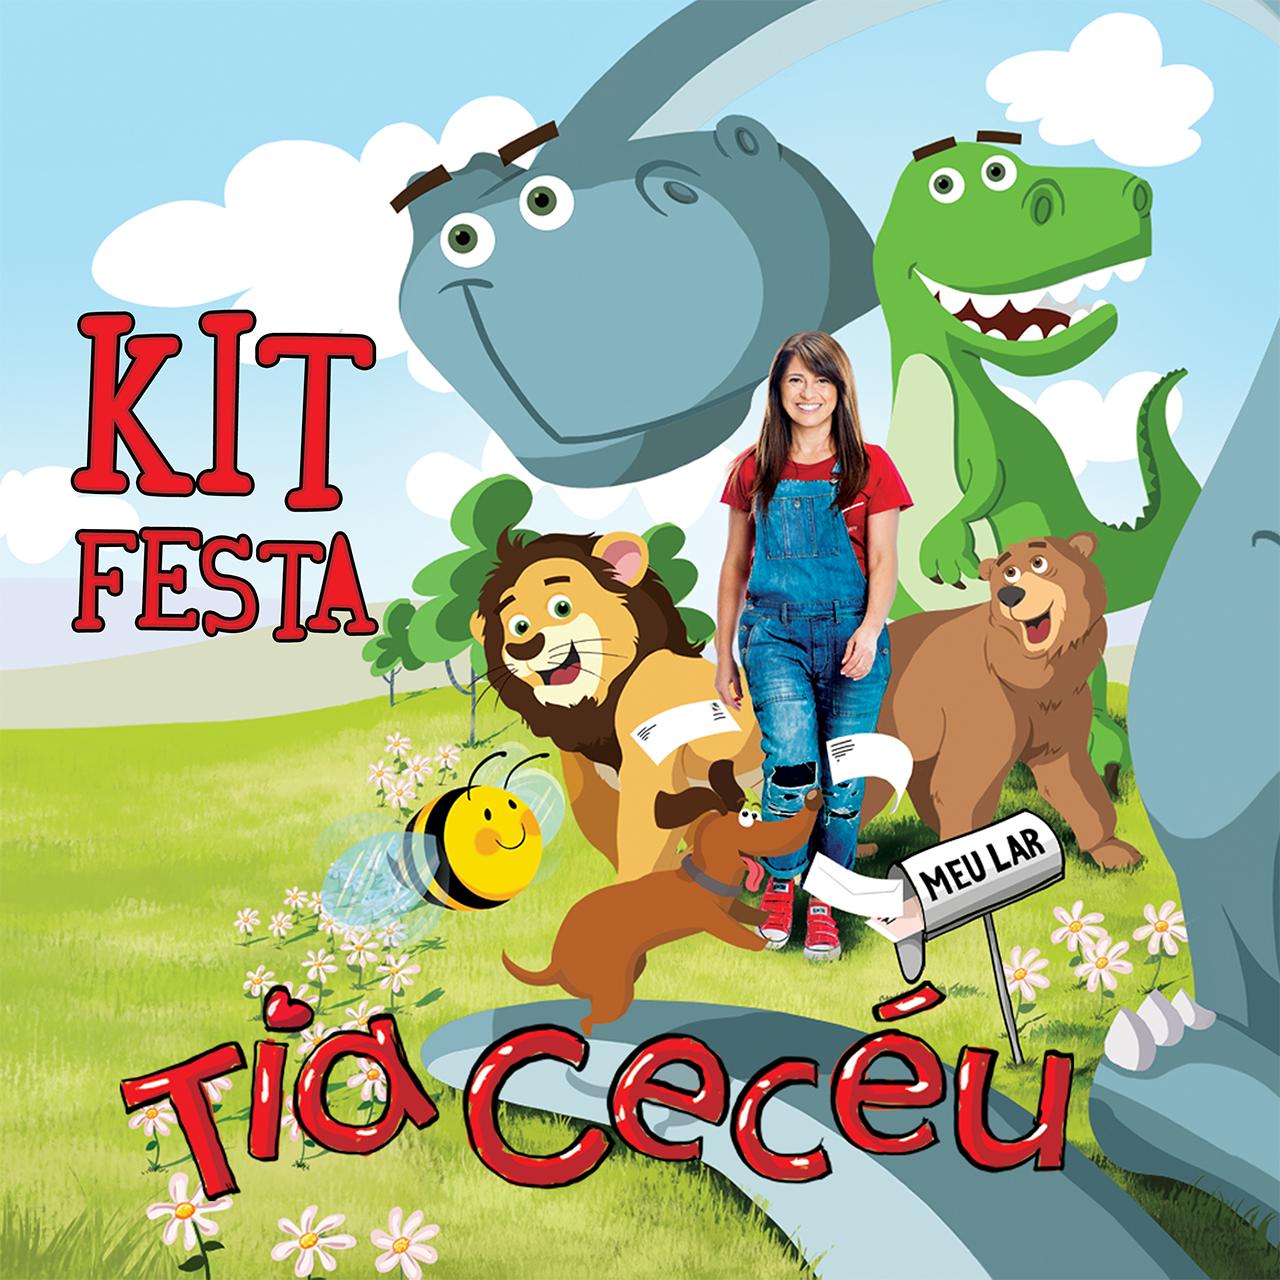 Kit  Festa  Tia Cecéu